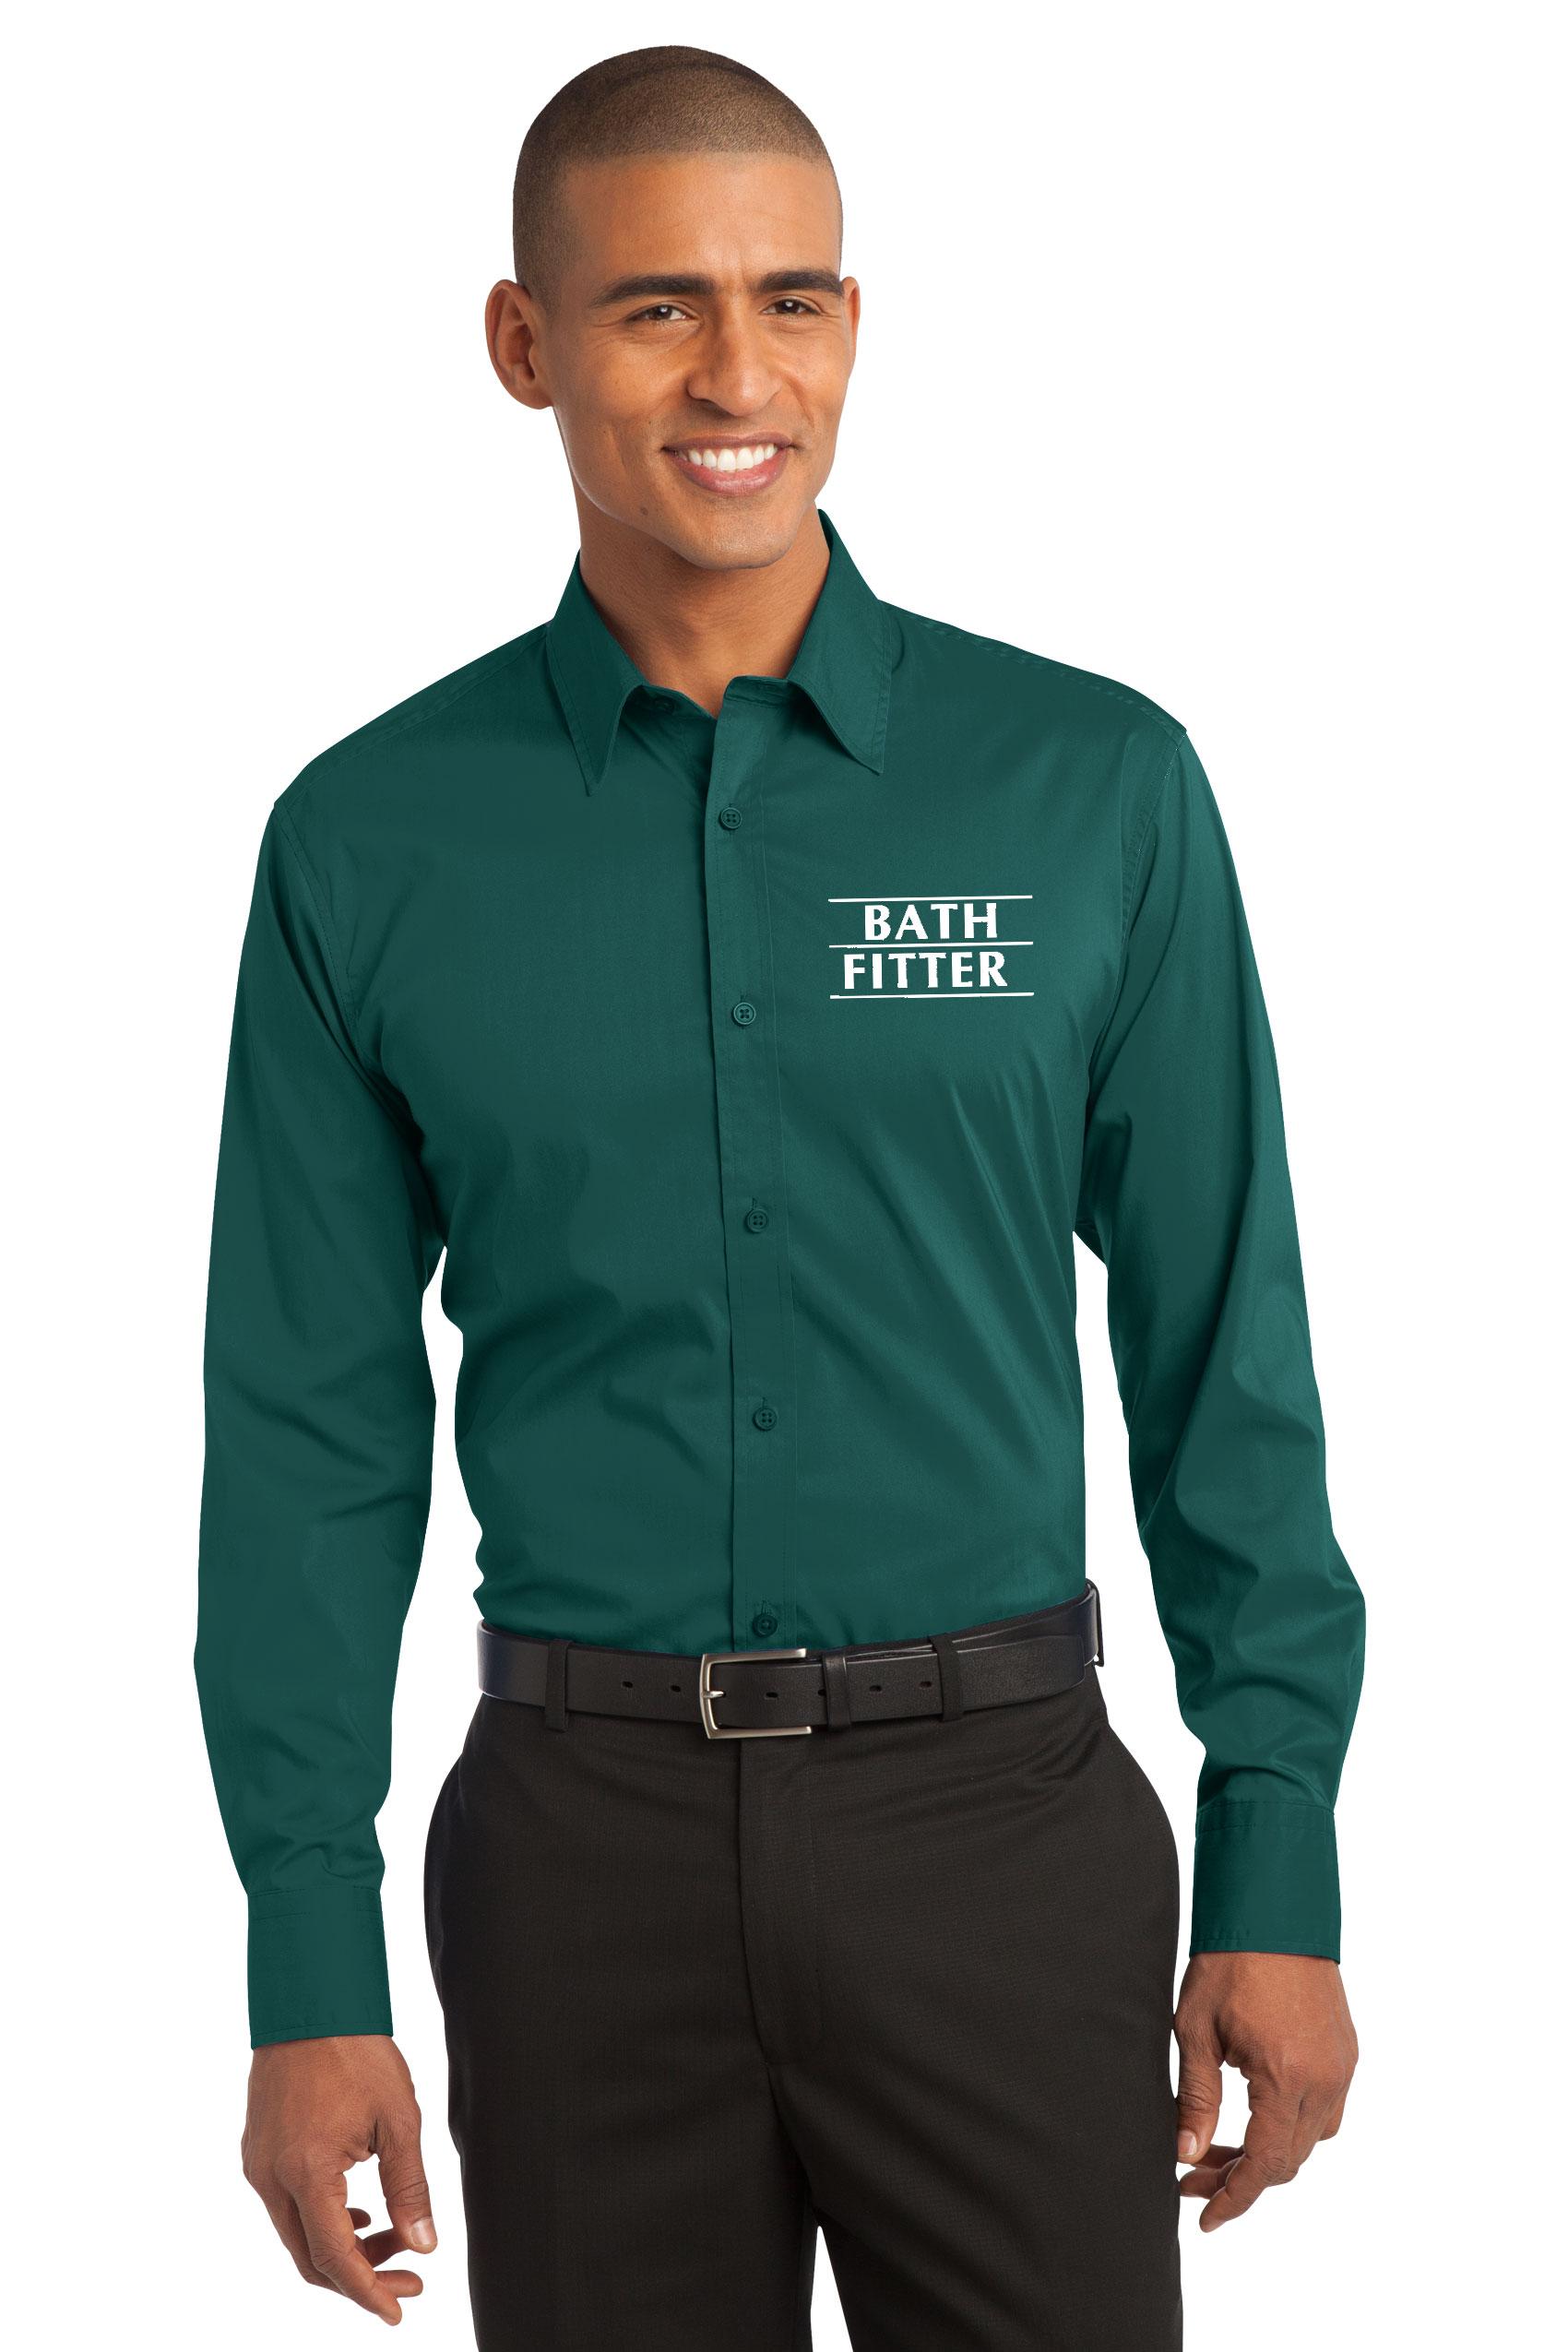 Bath fitter attire for Mens teal button down shirt